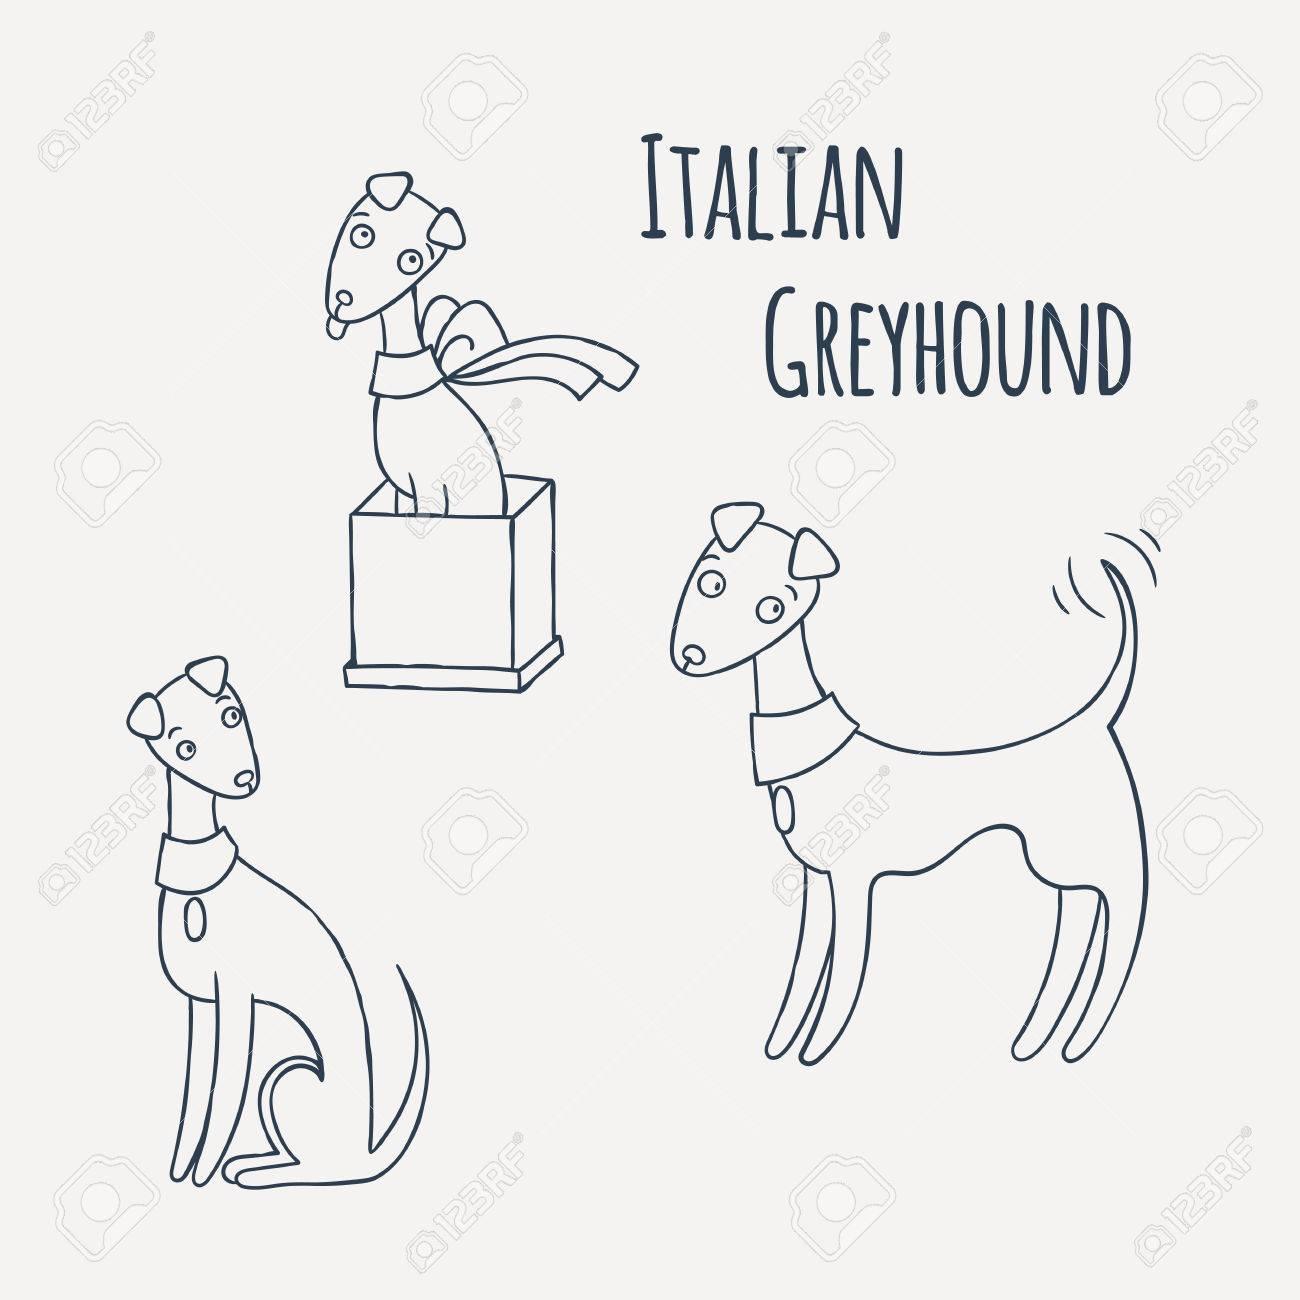 Italian Greyhound Cartoon Dog Set. Coloring Page. Vector ...